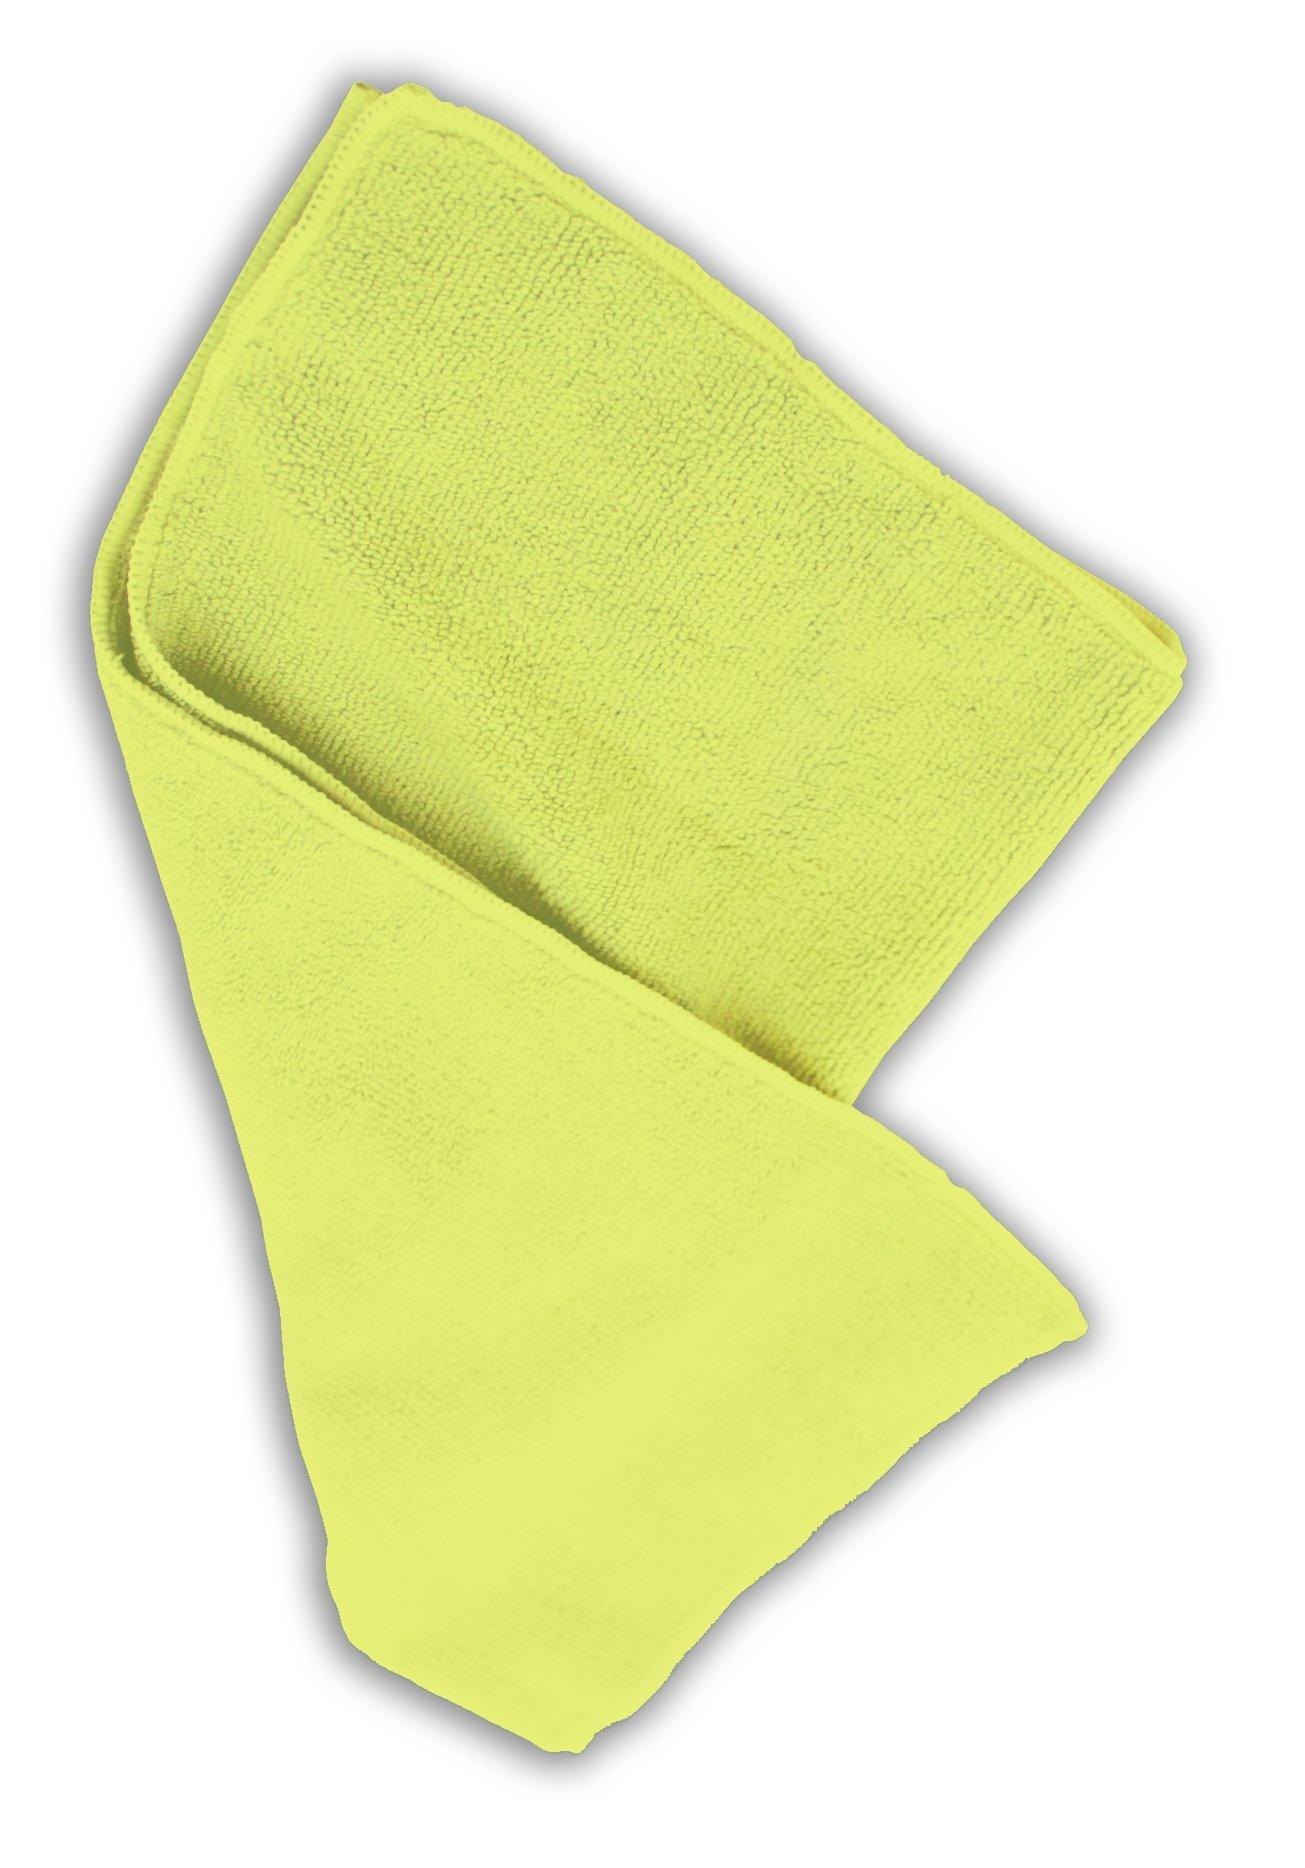 Impact LFK700 Microfiber All-Purpose Cloth, 16'' Length x 16'' Width, Yellow (15 Bags of 12)